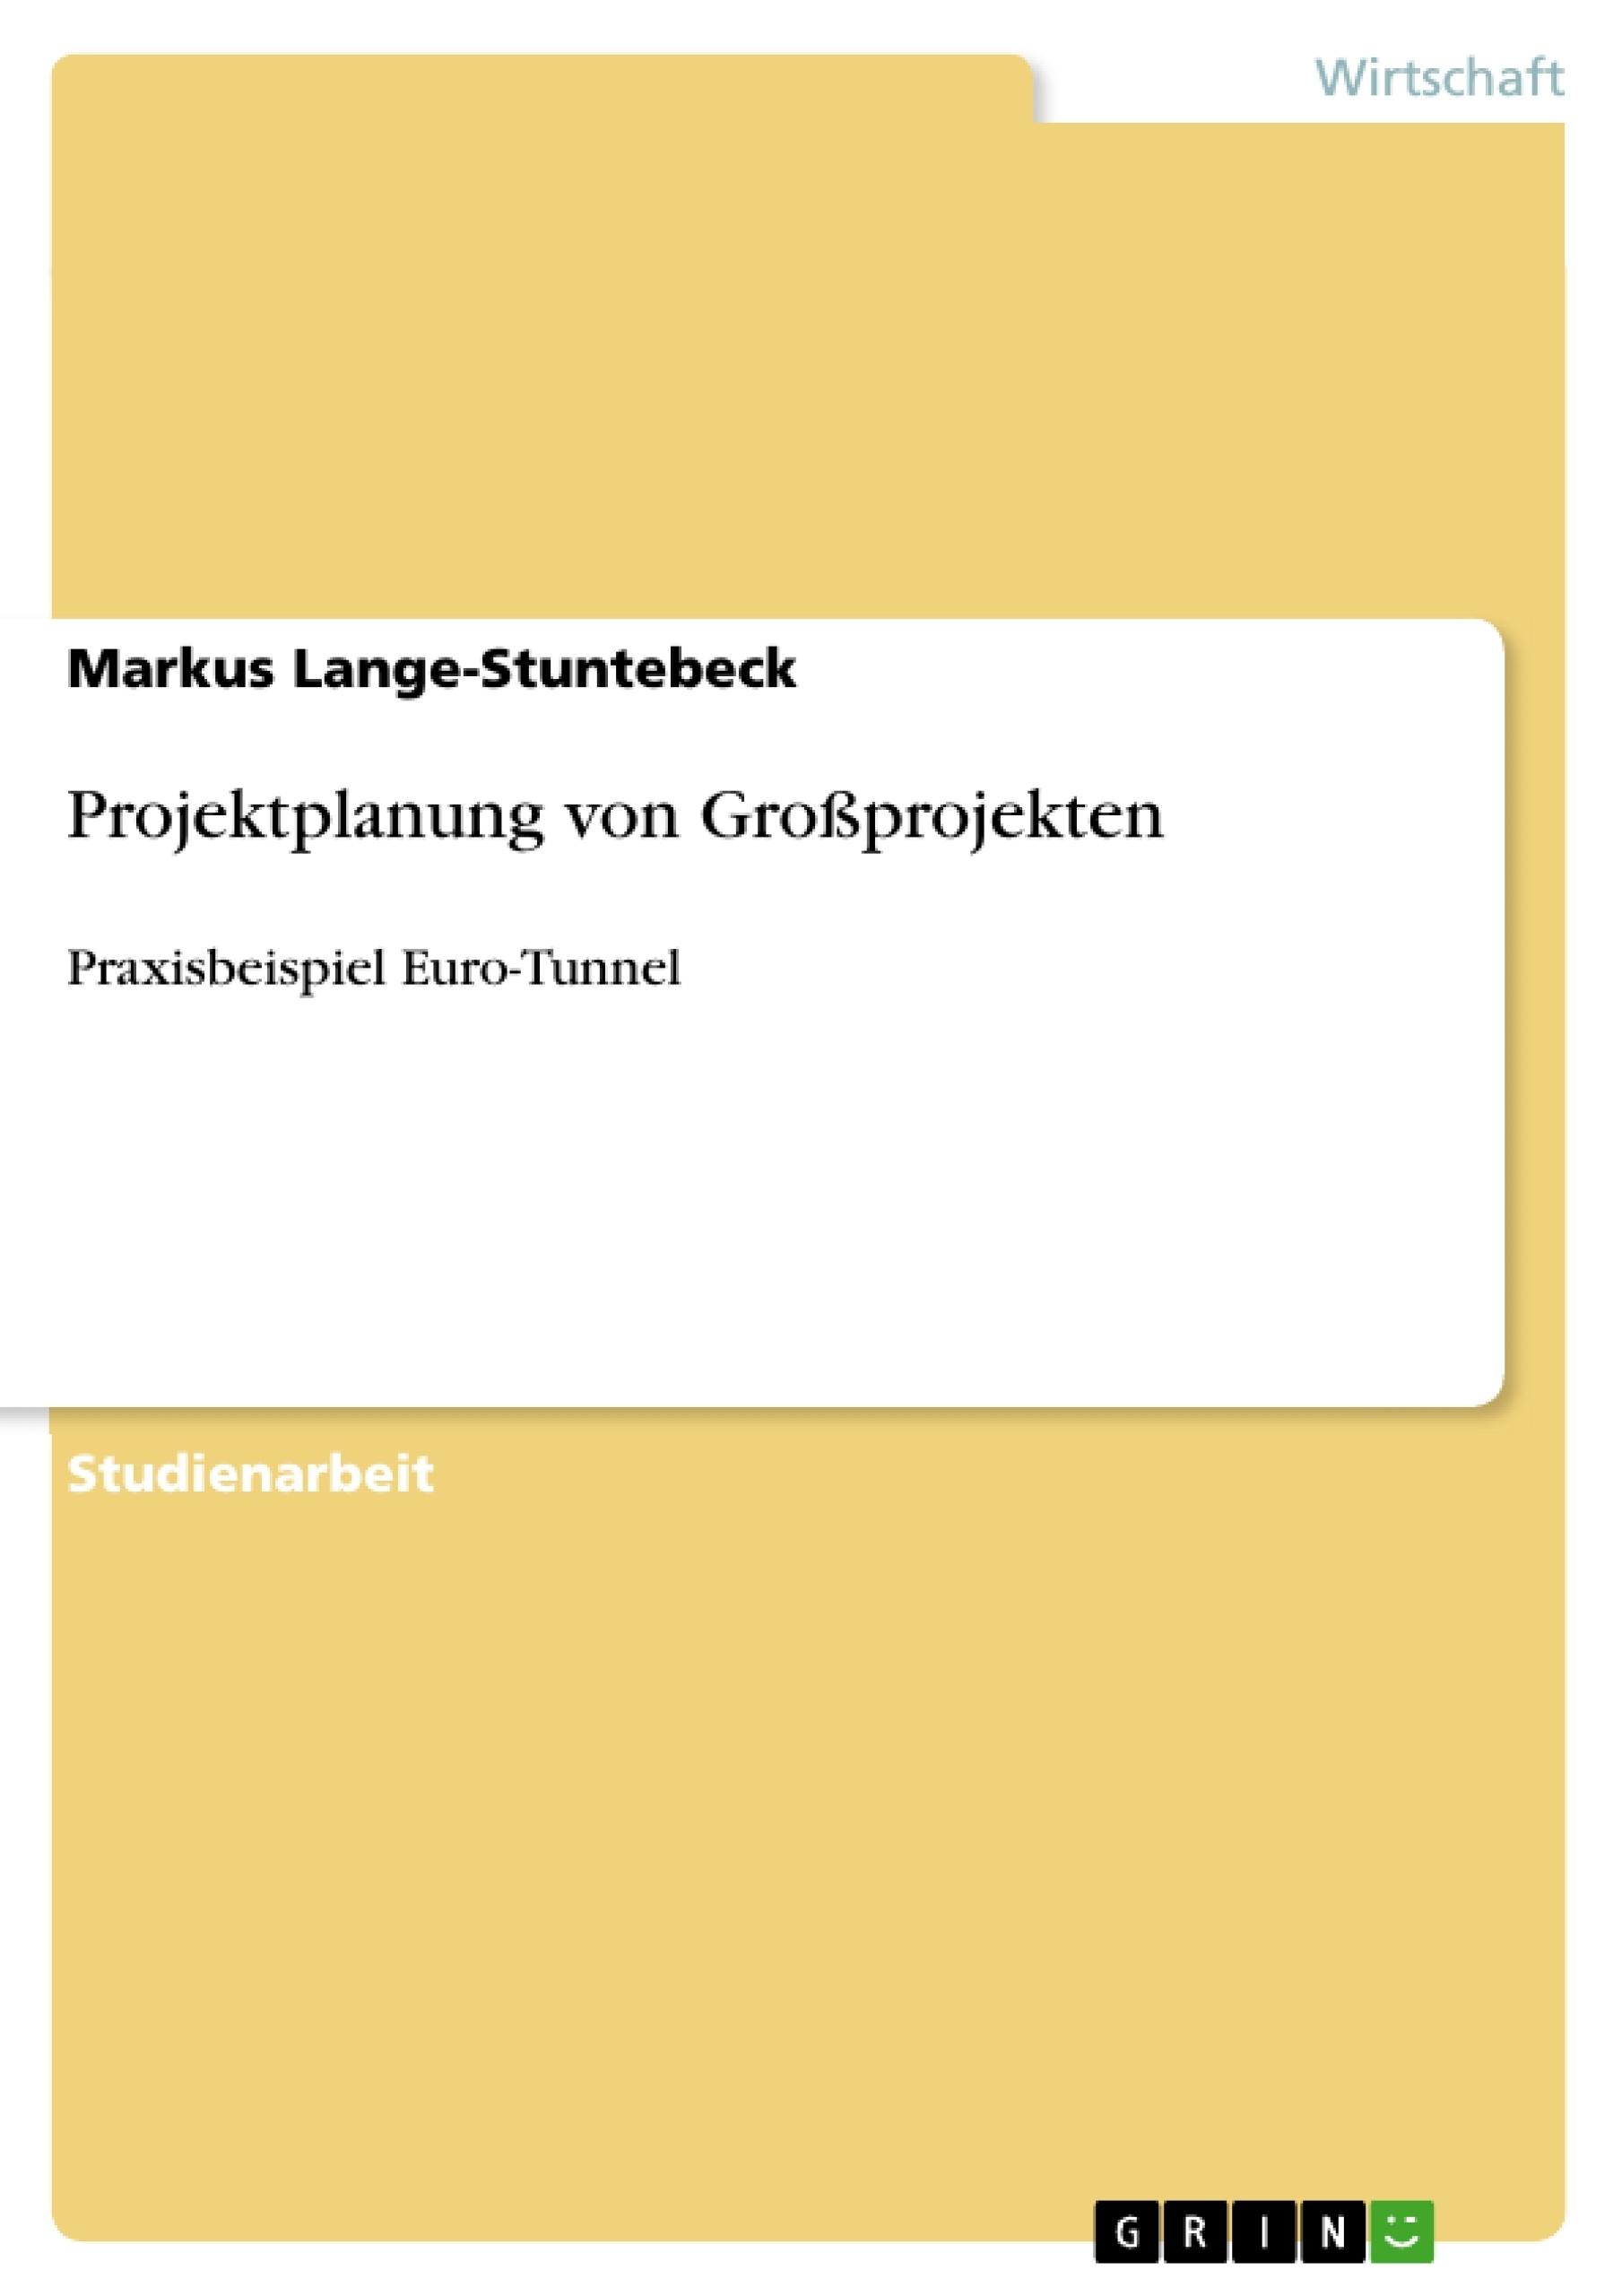 Titel: Projektplanung von Großprojekten